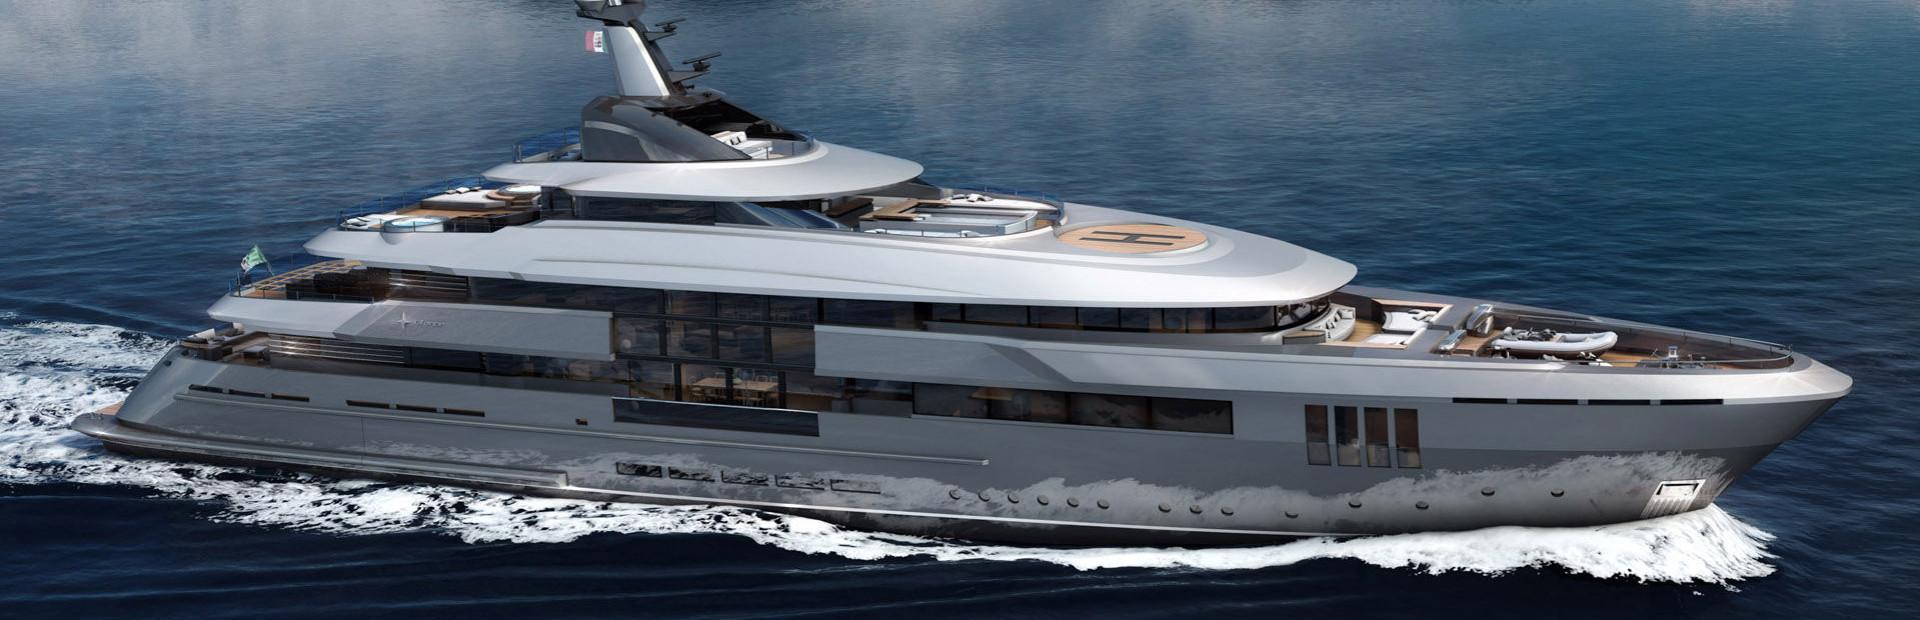 admiral-yachts-1